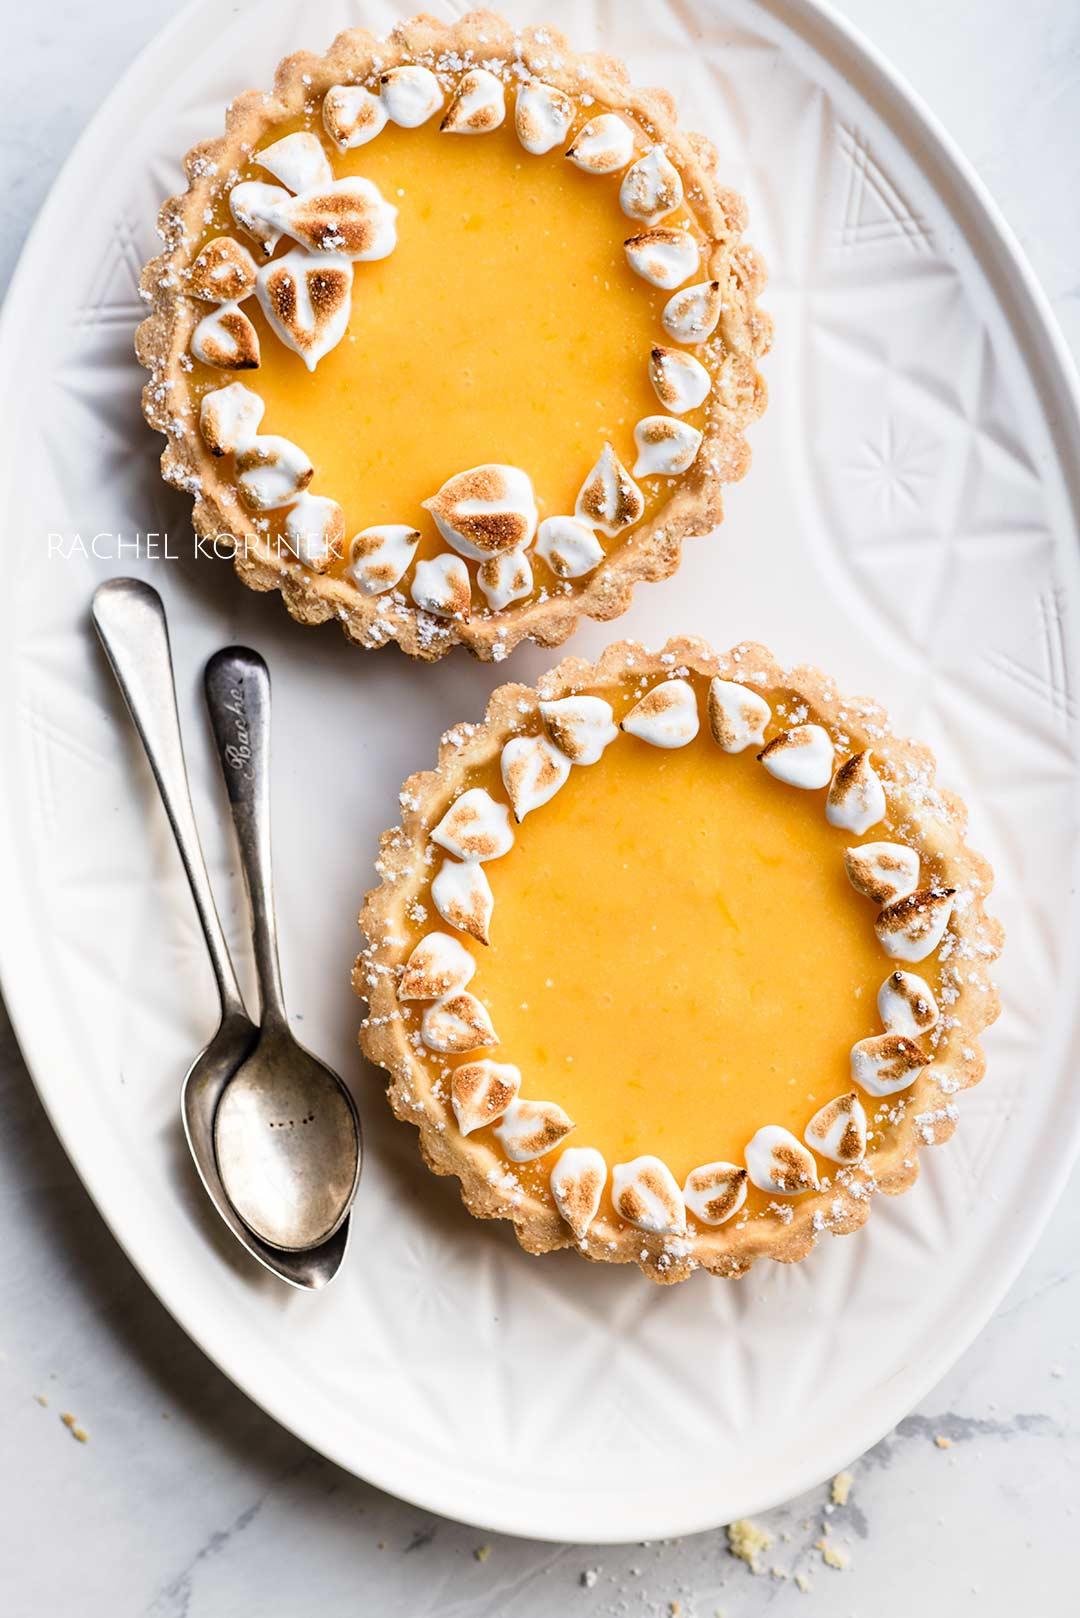 Rachel Korinek Food Photography | Lemon Meringue Tarts Wreaths